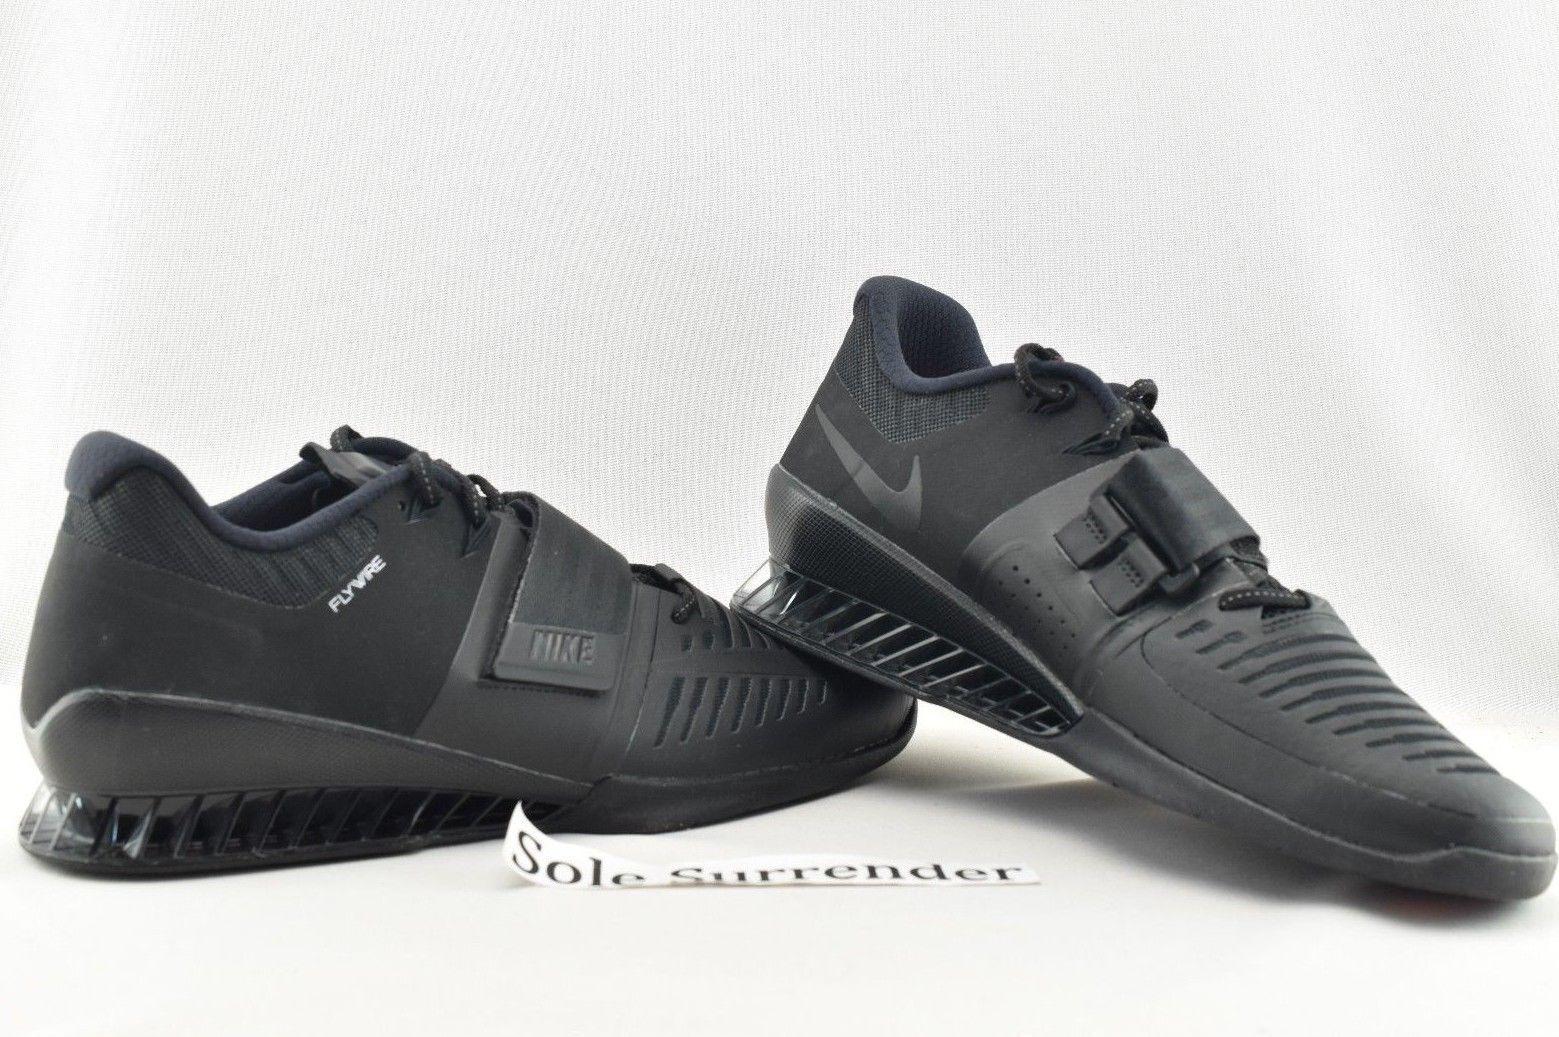 Nike Romaleos 3 - CHOOSE SIZE - 852933-004 Triple Blackout III Lifting Crossfit